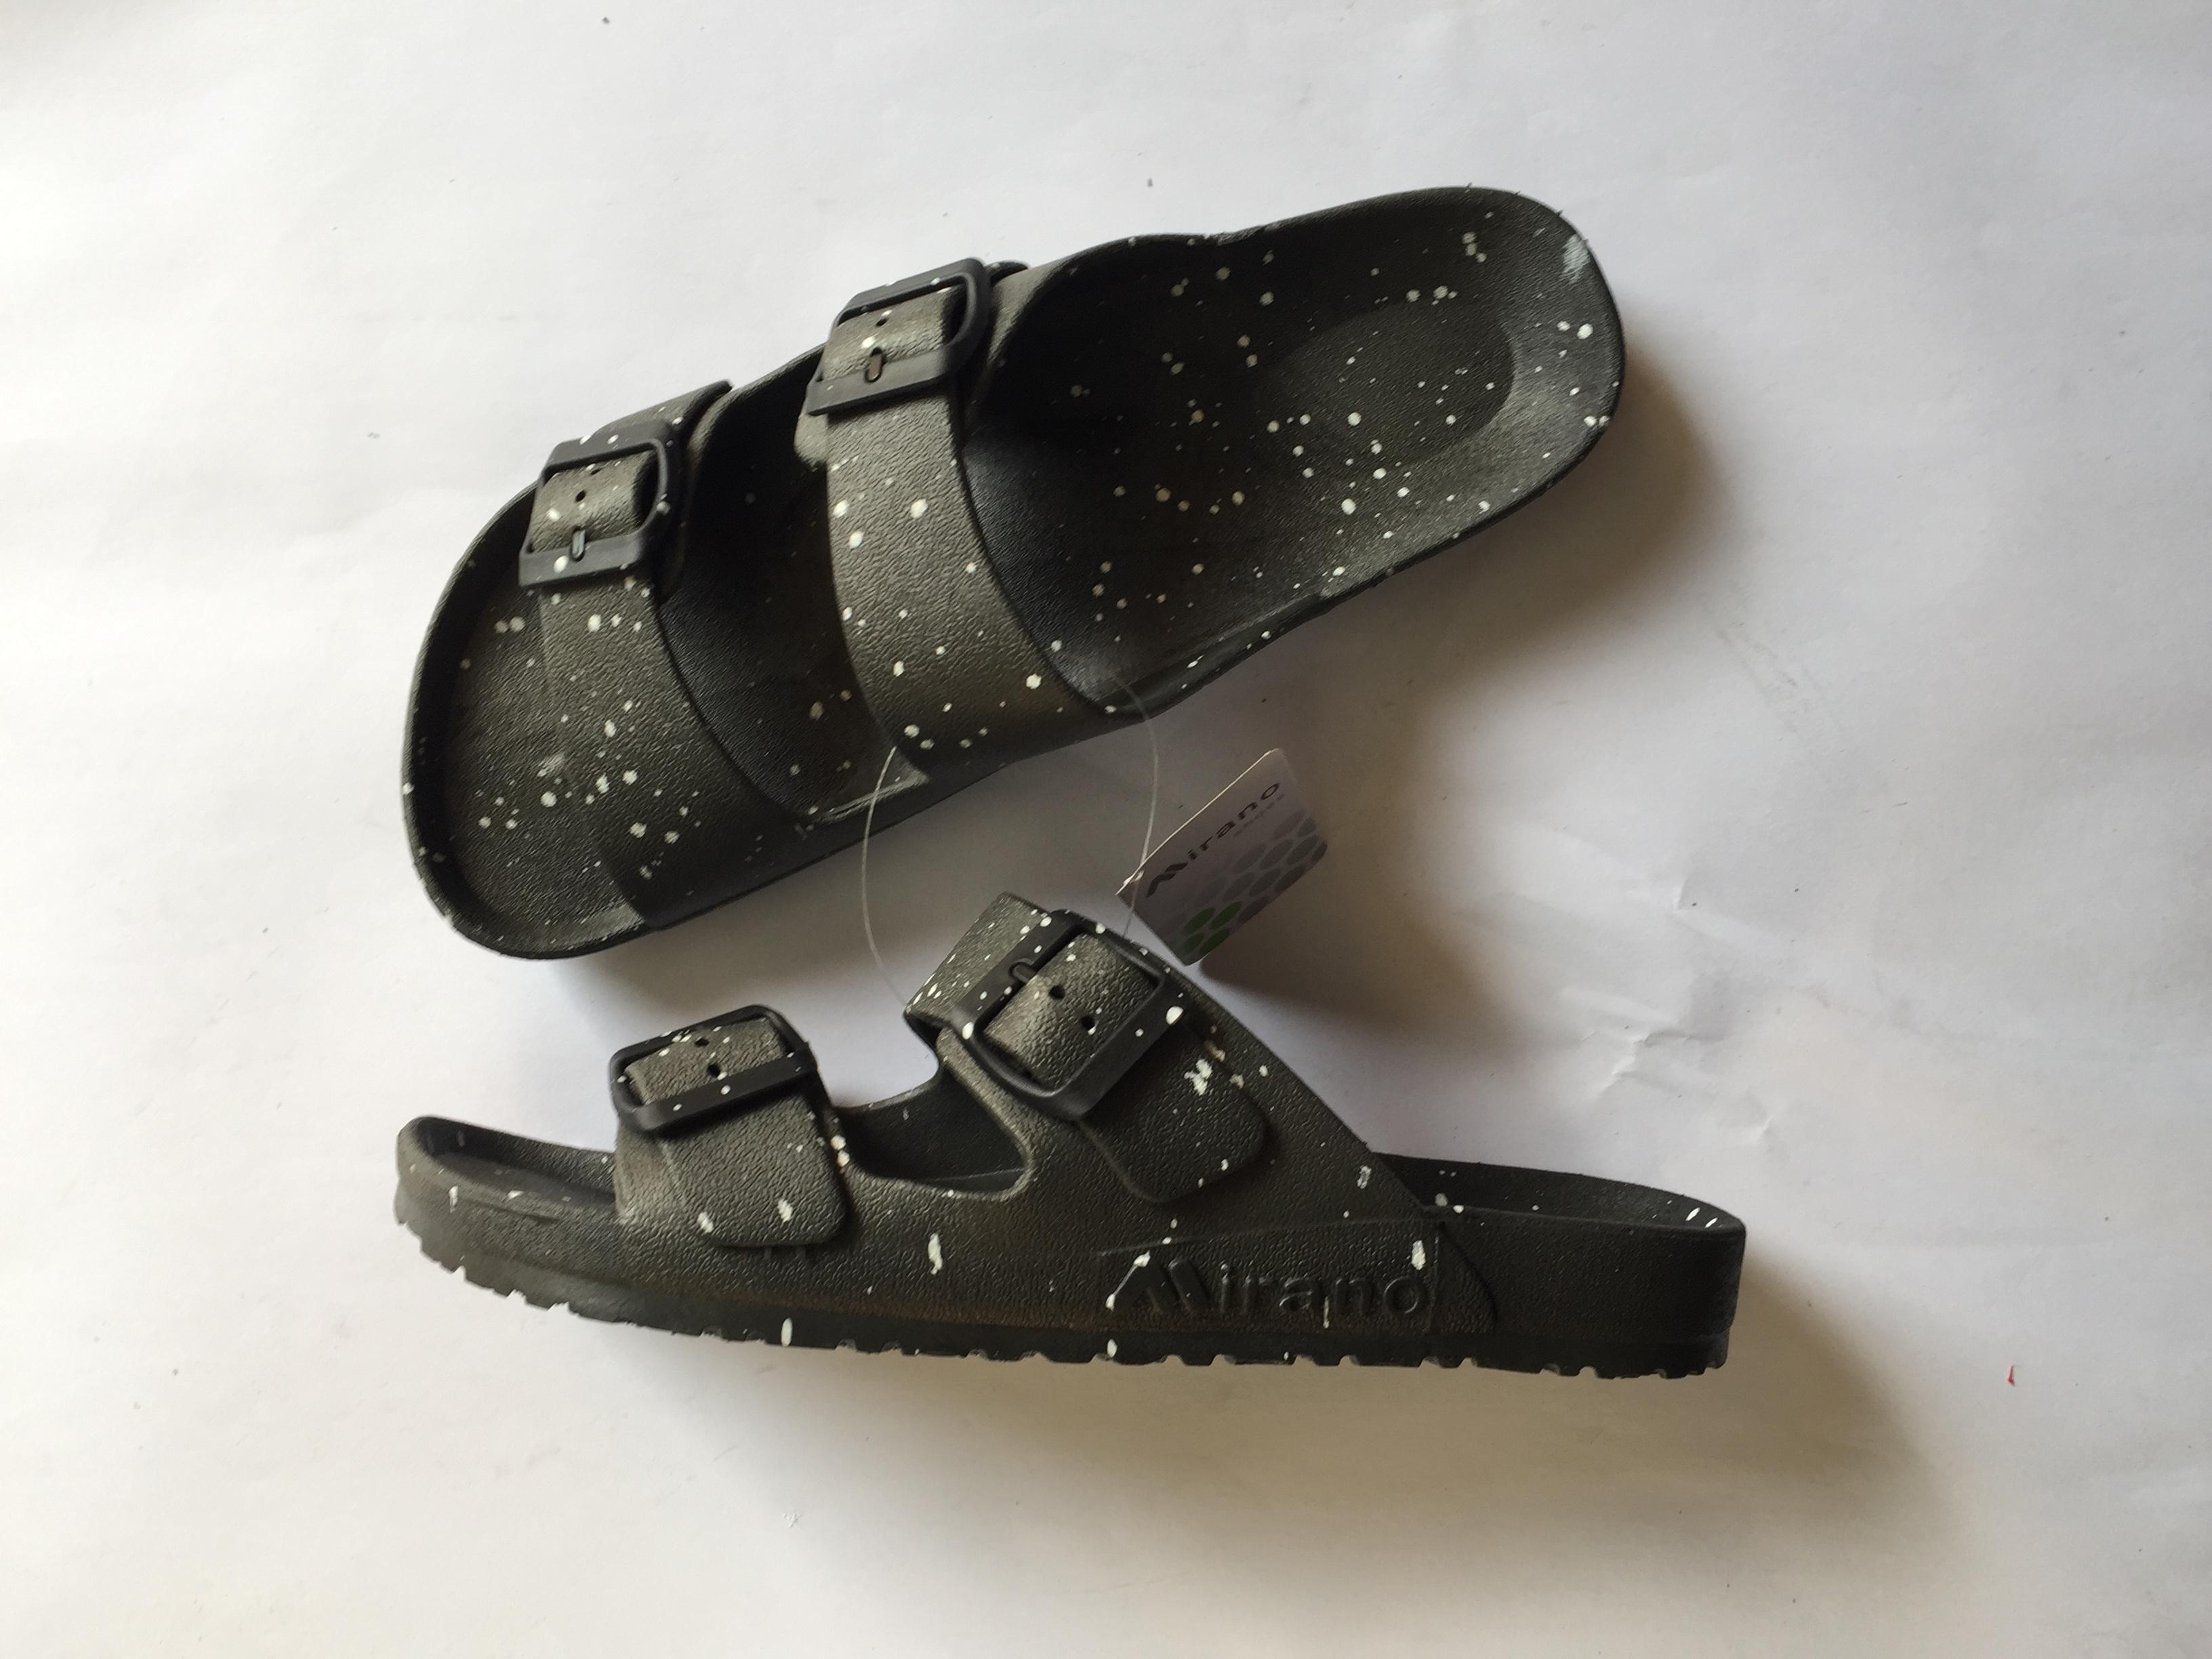 M&w High Fashion Slipper For Men By Mirano-Shop.